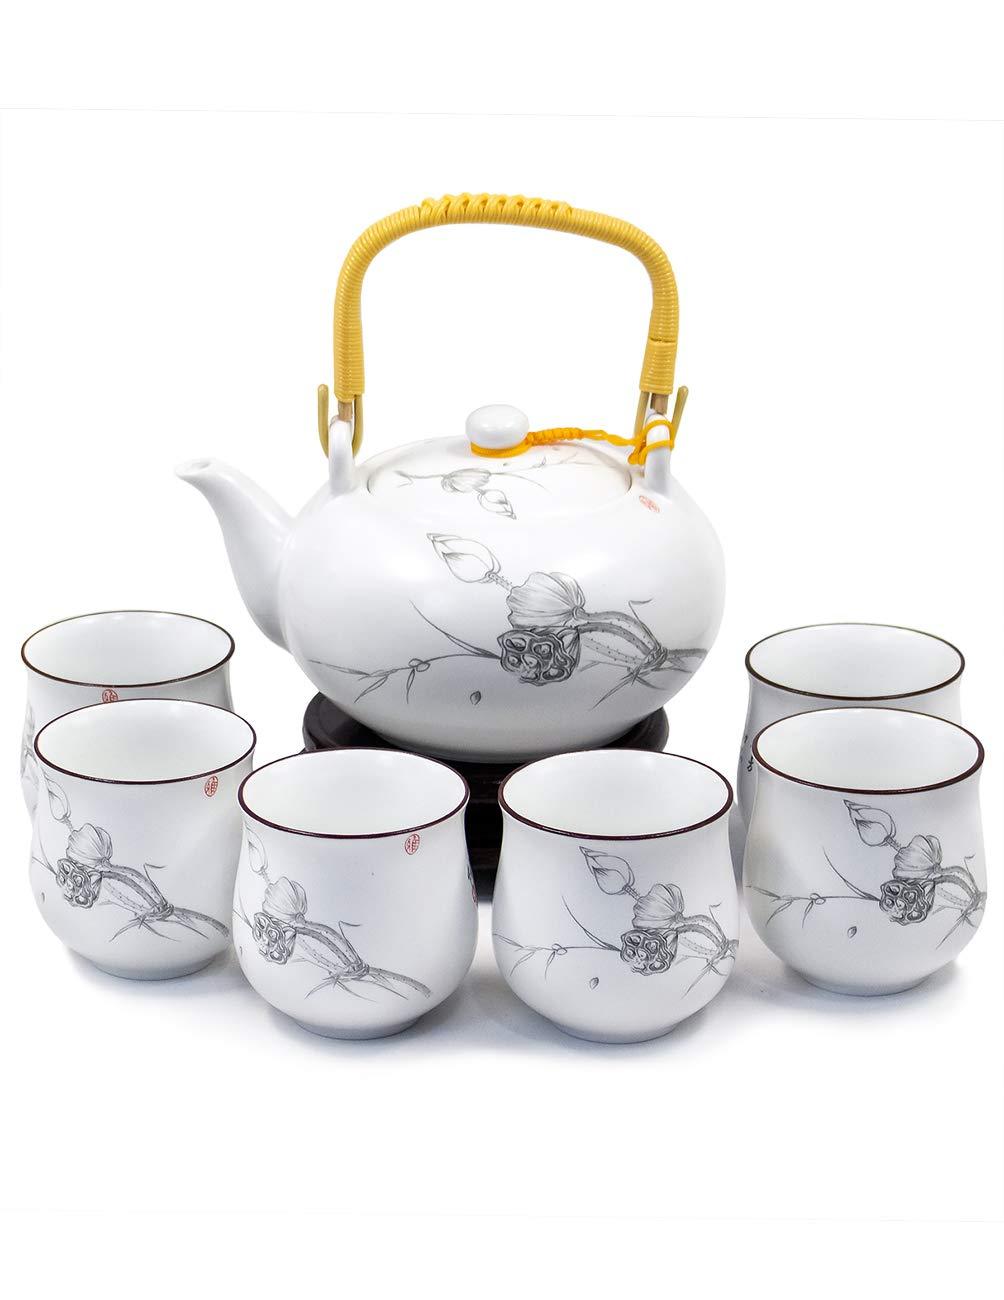 Dahlia Handpainted Porcelain Tea Gift Set: Teapot+ 6 Teacups in Gift Box, Purity Lotus